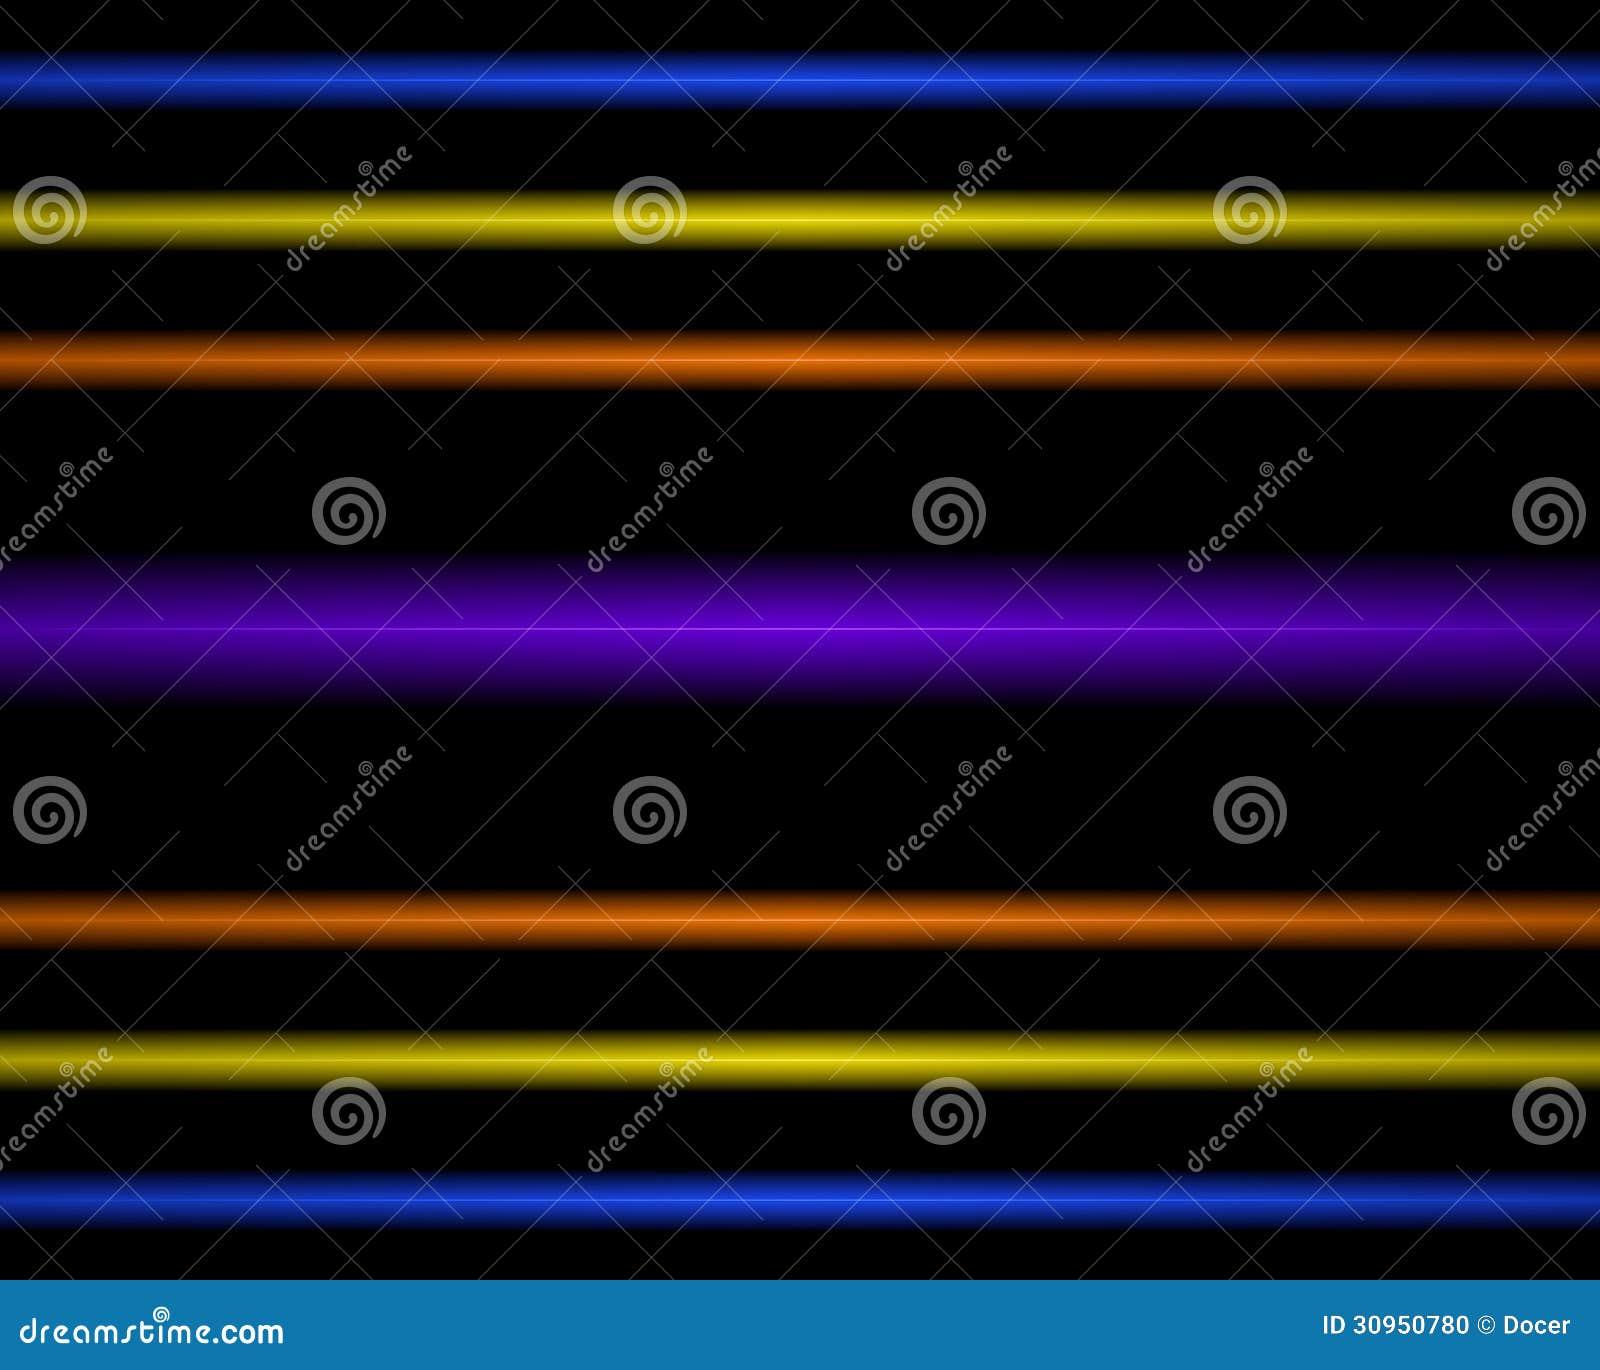 Stock Photo: Multi Colored neon light lamp. straight horizontal lines